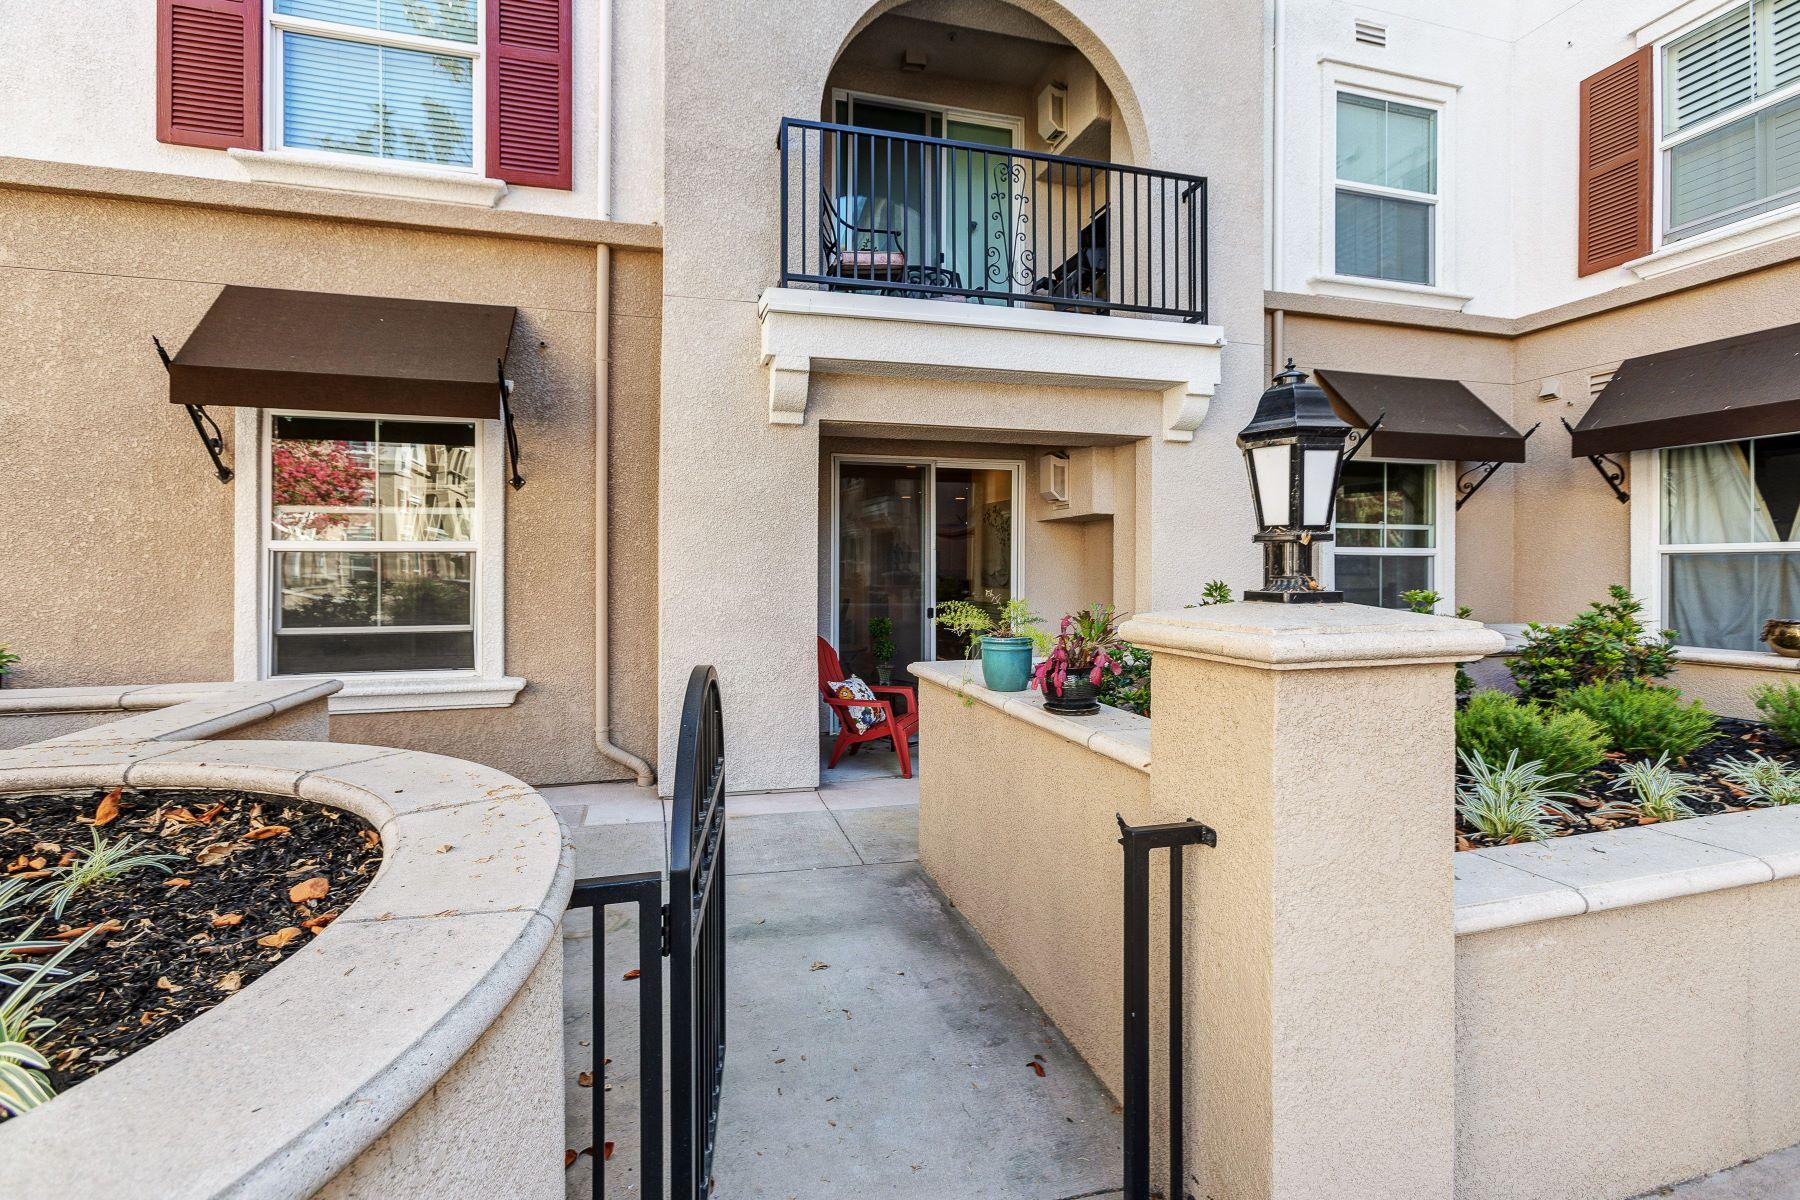 Condominiums for Sale at 3275 Dublin Boulevard, Dublin, CA 94568 3275 Dublin Boulevard Unit #117 Dublin, California 94568 United States